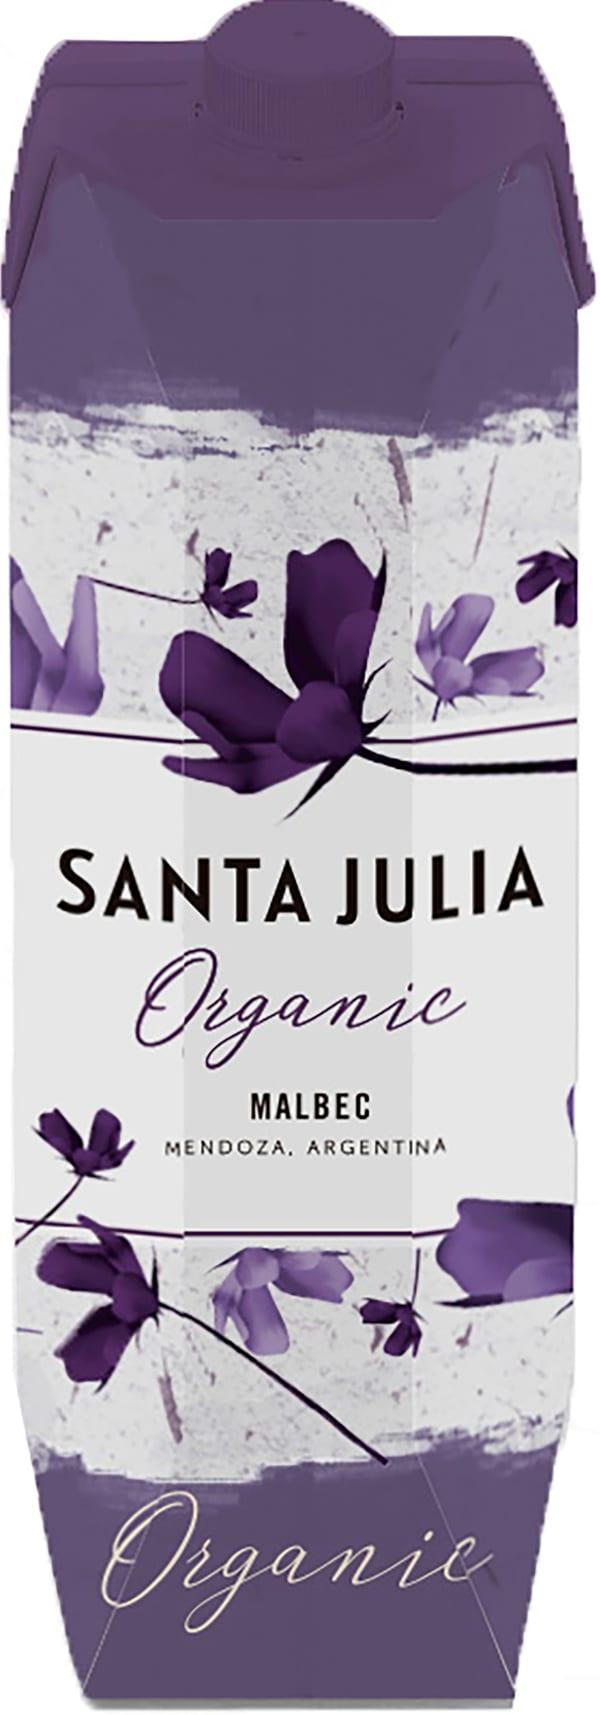 Santa Julia Organic Malbec 2017 carton package